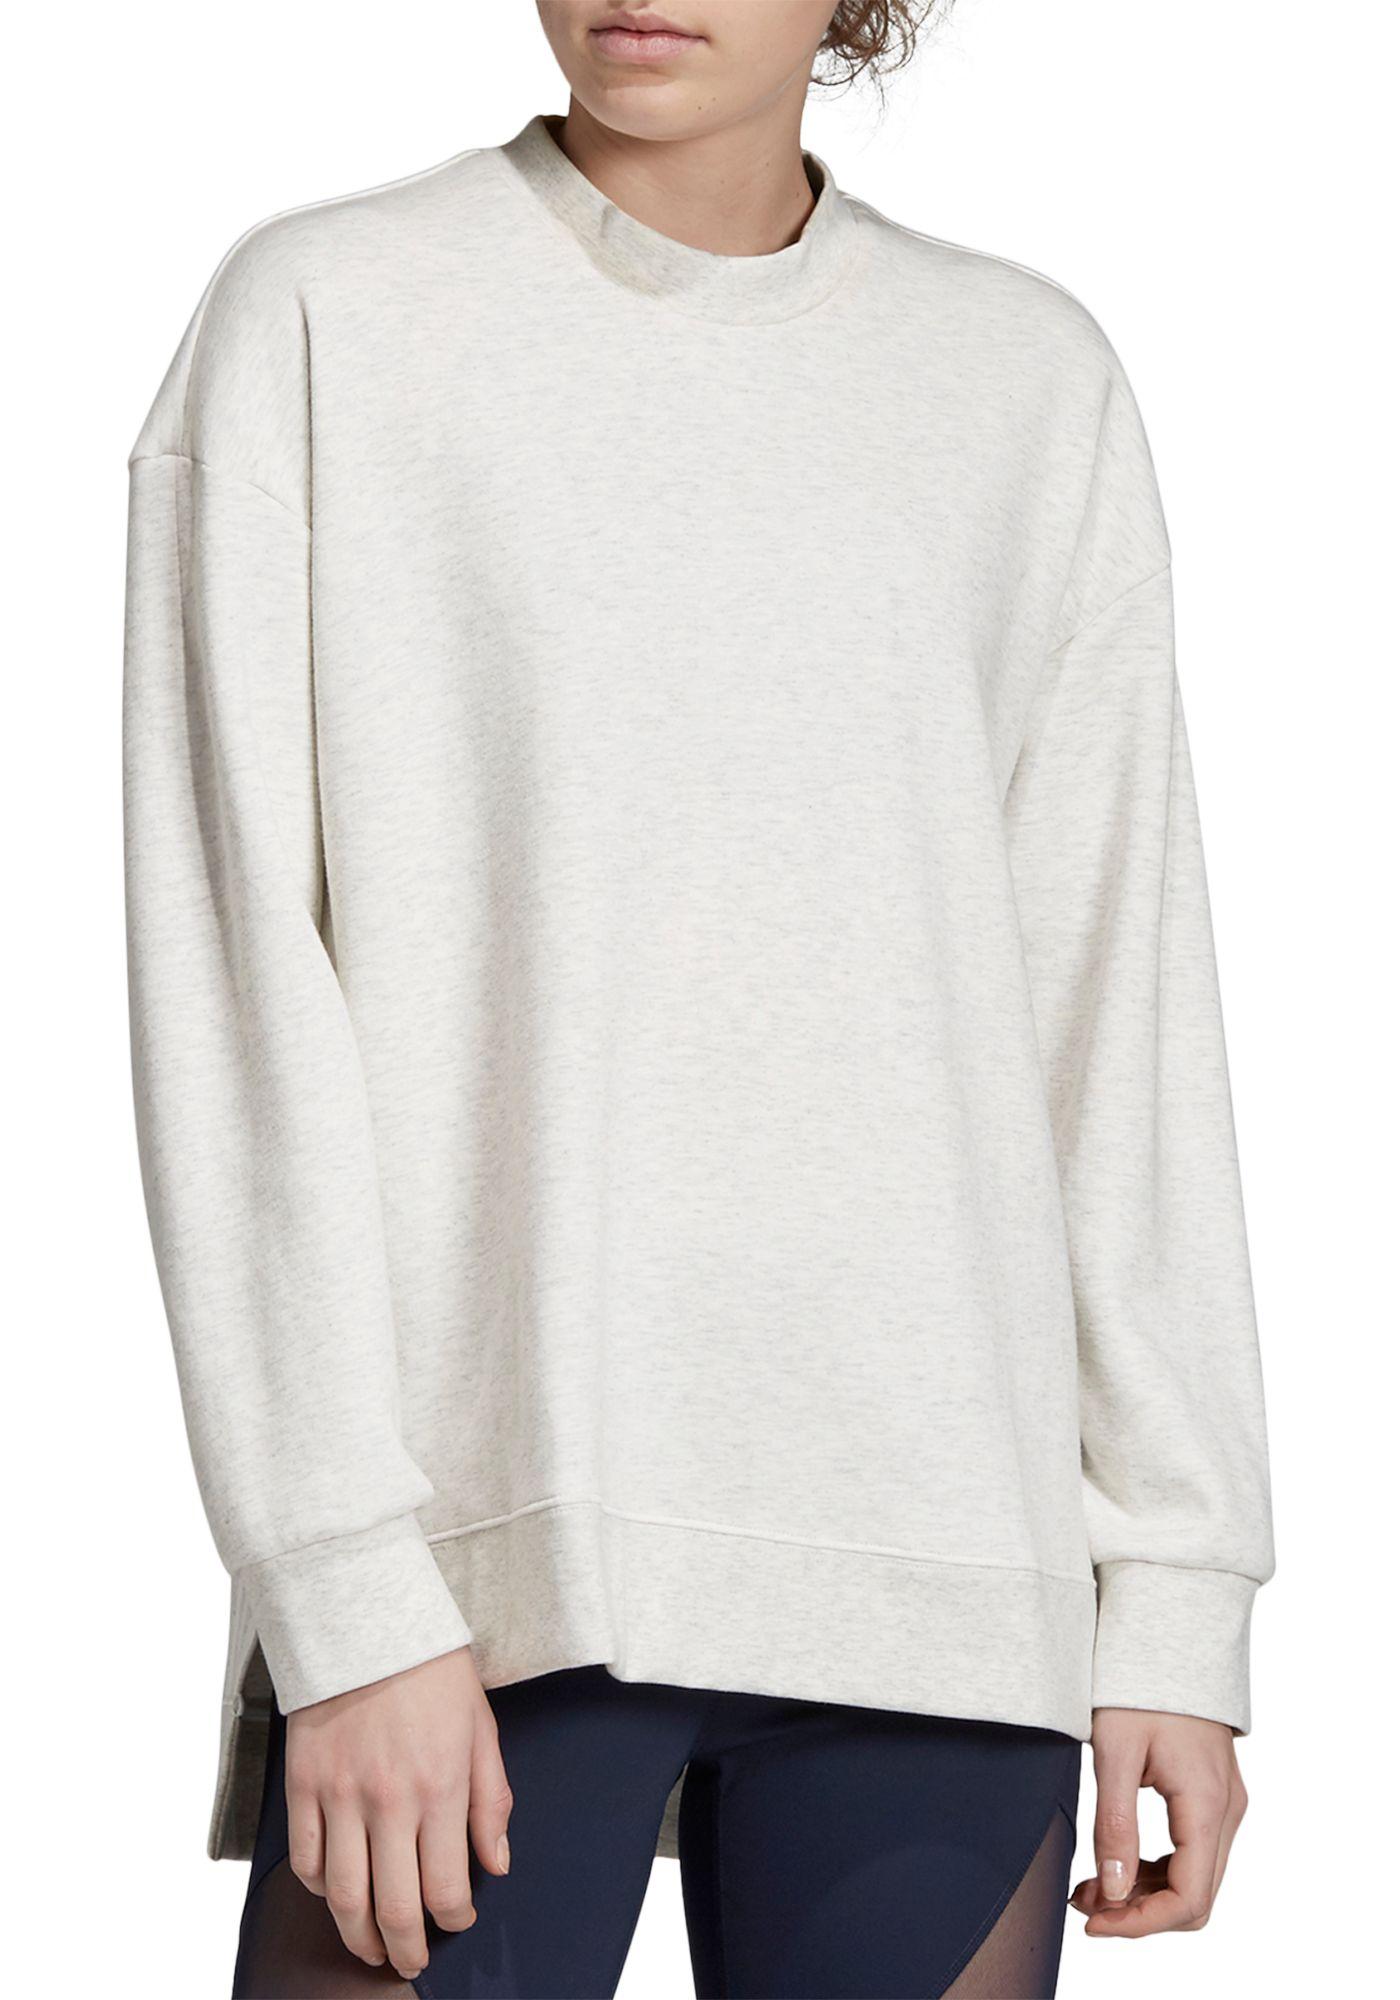 adidas Women's Wanderlust Second Layer Sweatshirt